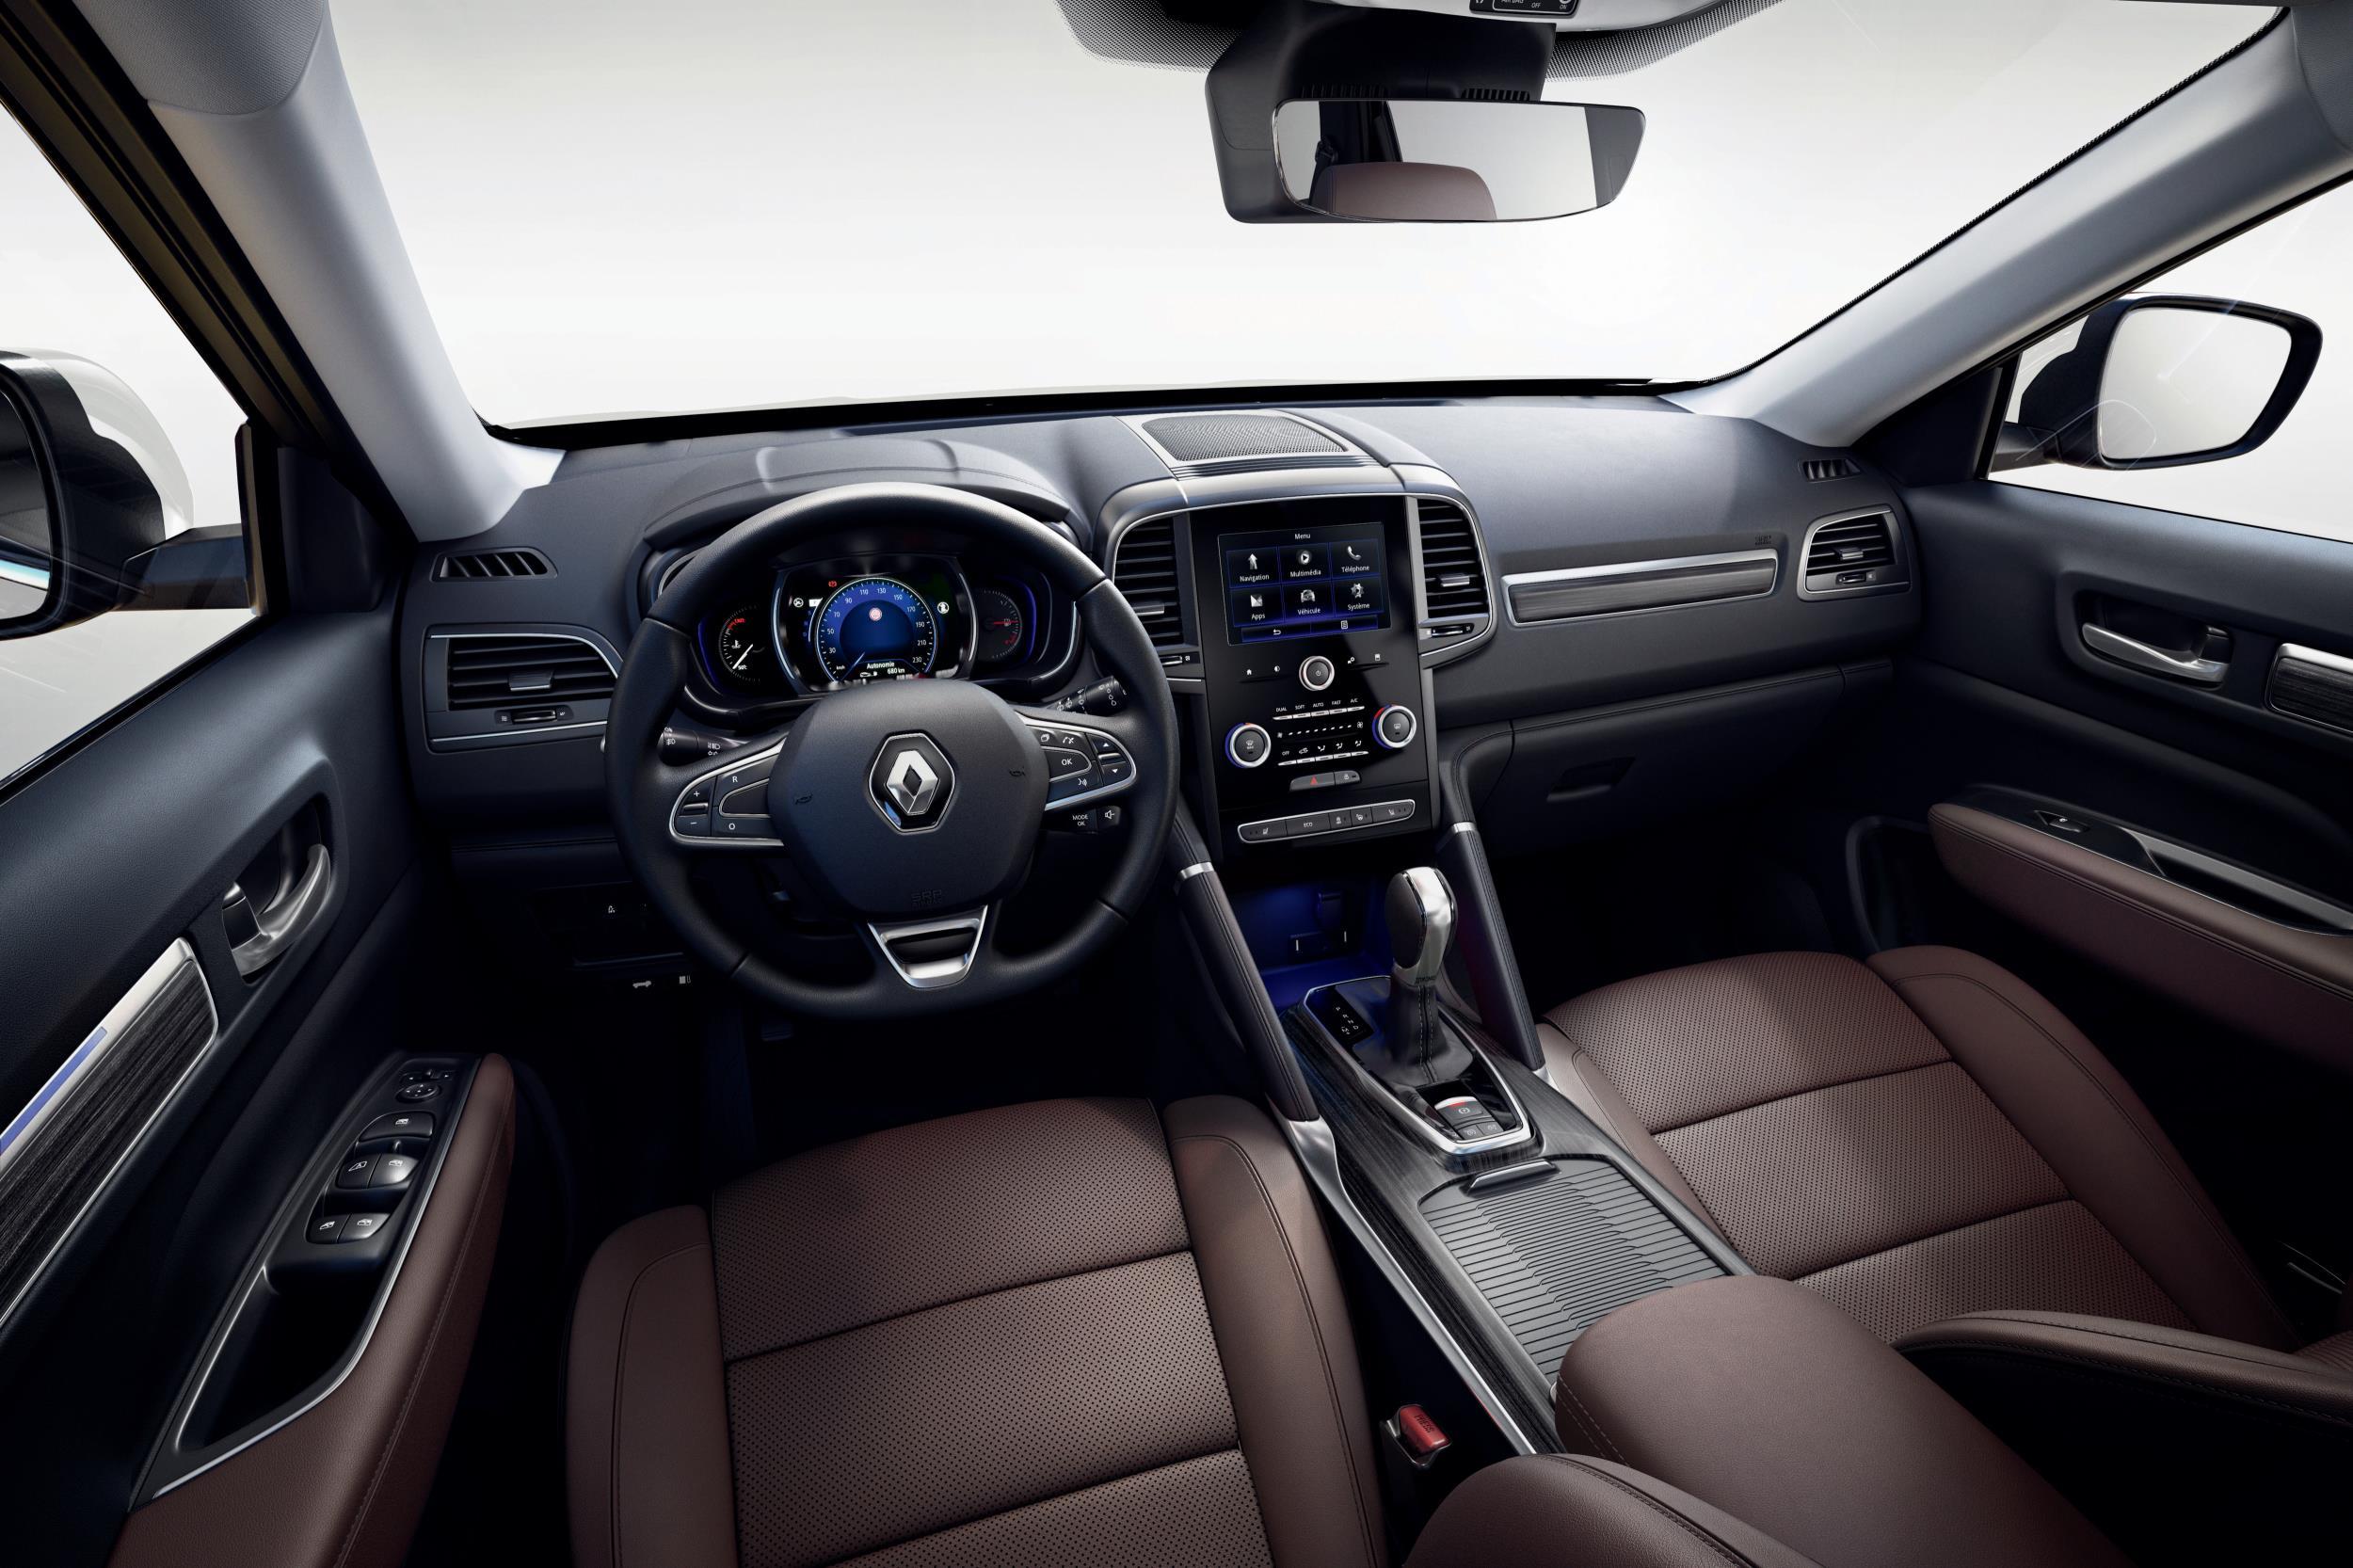 2020 Renault Koleos Revealed With Mild Updates Performancedrive